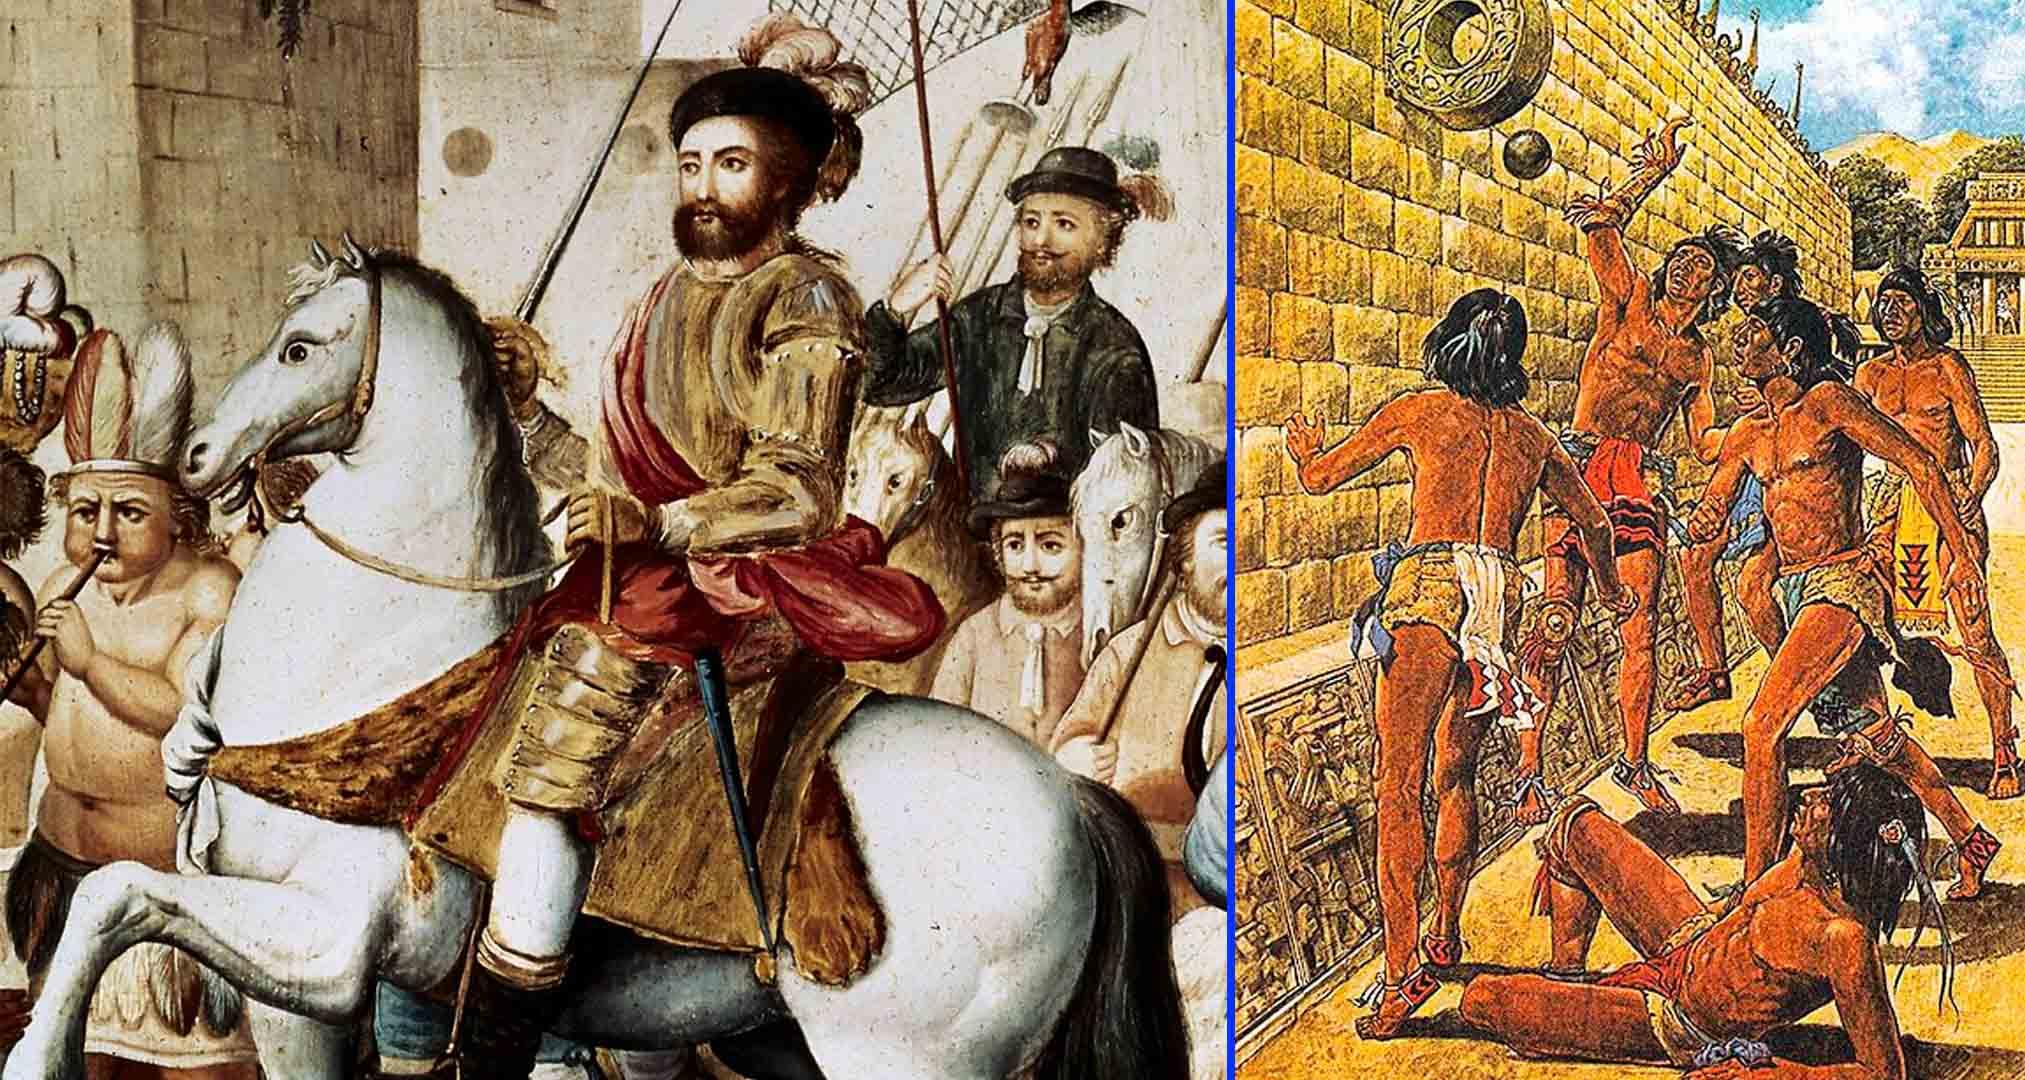 Bernal Díaz del Castillo,conquistadorespañol- Juego Azteca